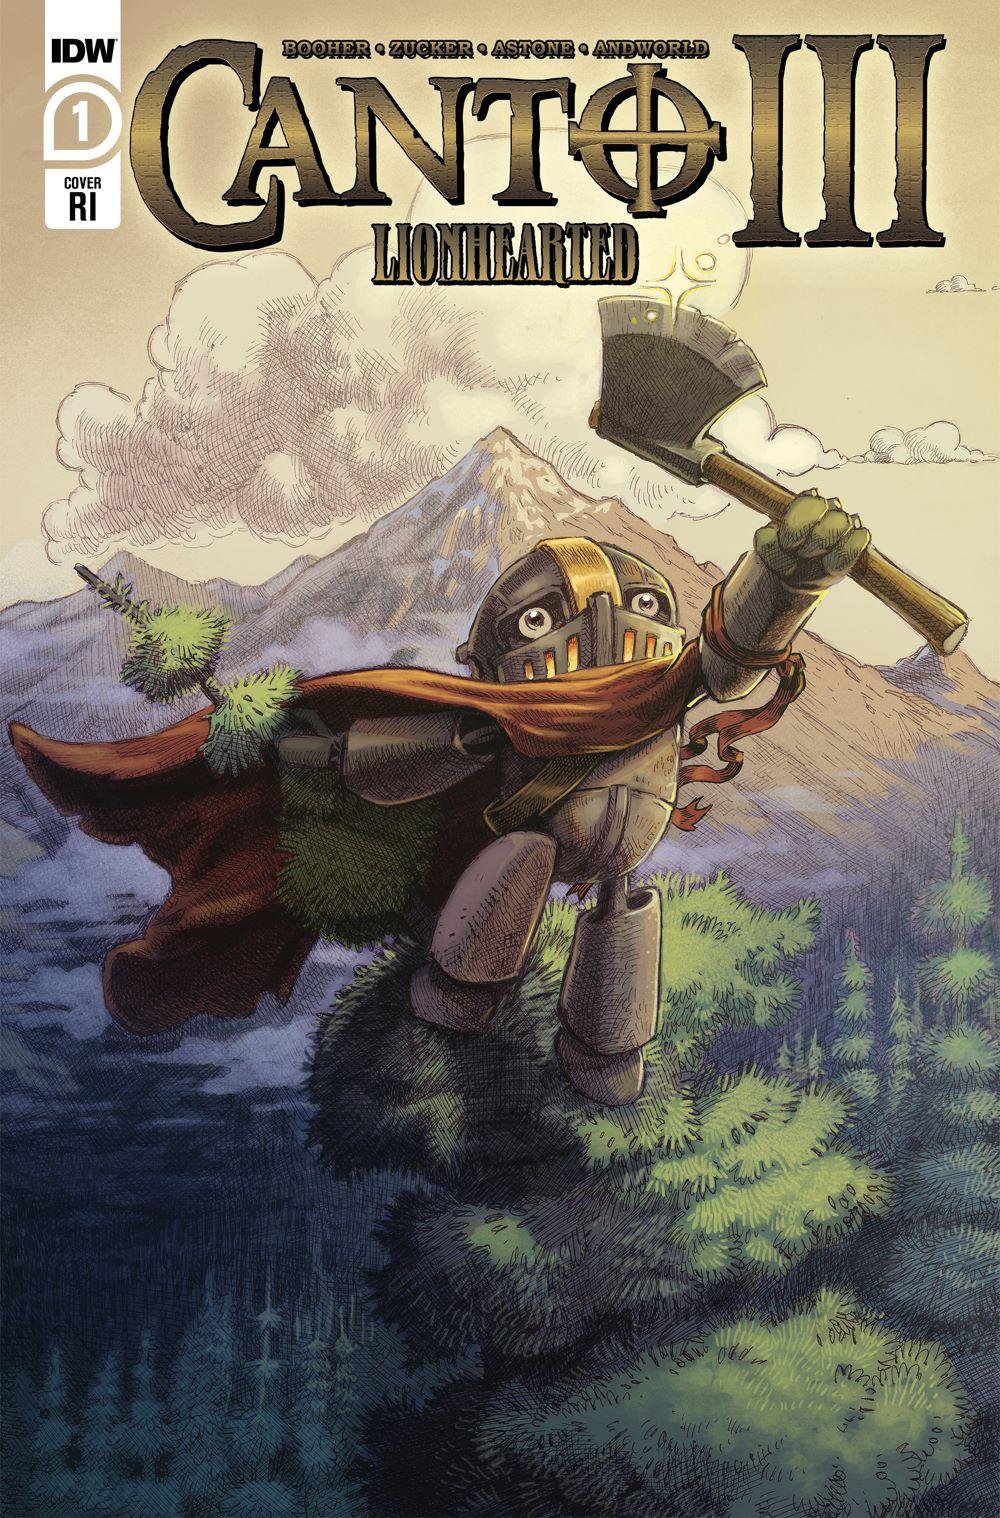 Canto-Lionhearted01_cvrRI ComicList Previews: CANTO III LIONHEARTED #1 (OF 6)